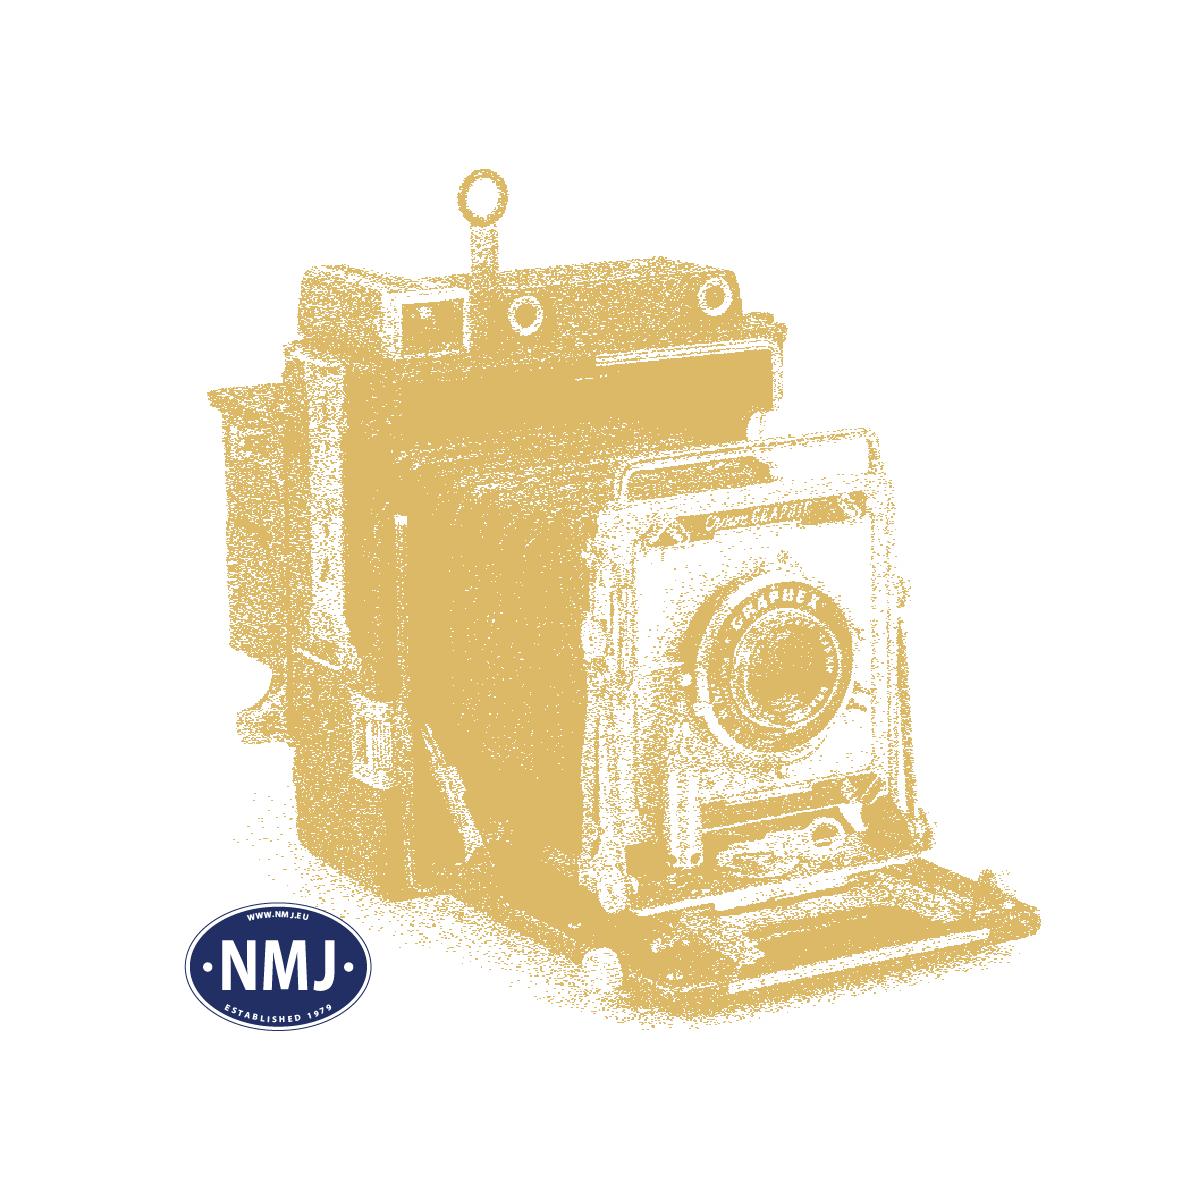 "NMJT110.302 - NMJ Topline FR3-2 21264 der NSB, ""NSB Meny Café"""